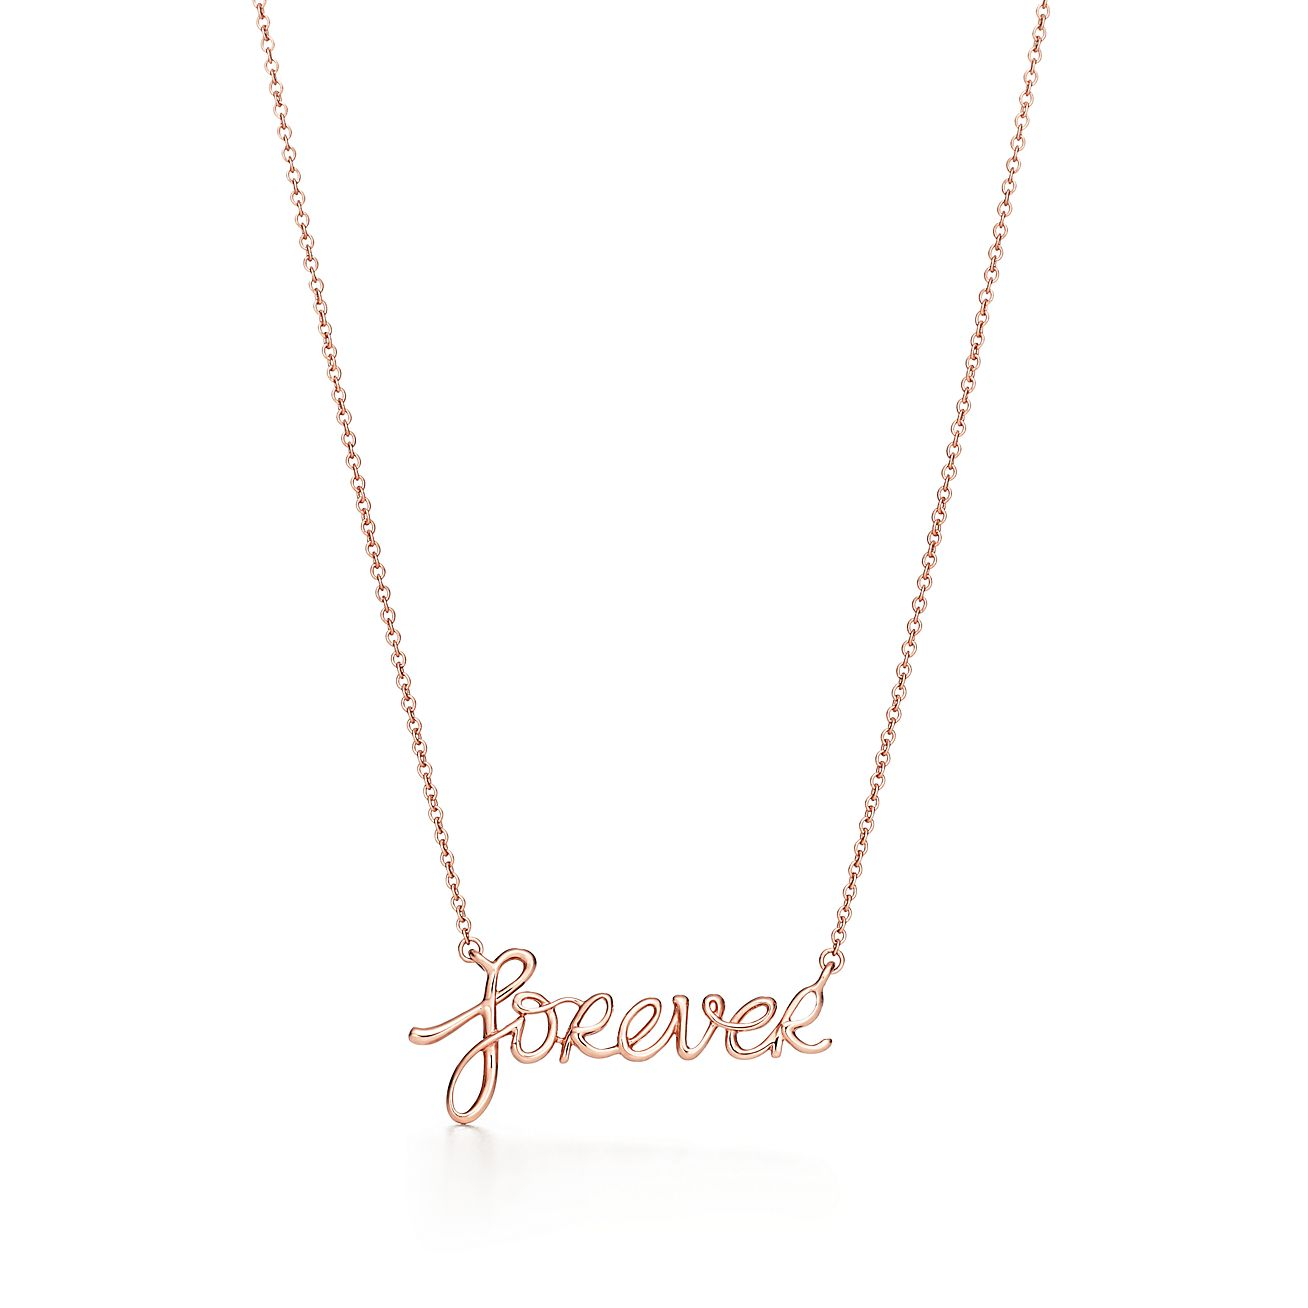 Paloma S Graffiti Forever Pendant In 18k Rose Gold Tiffany Co